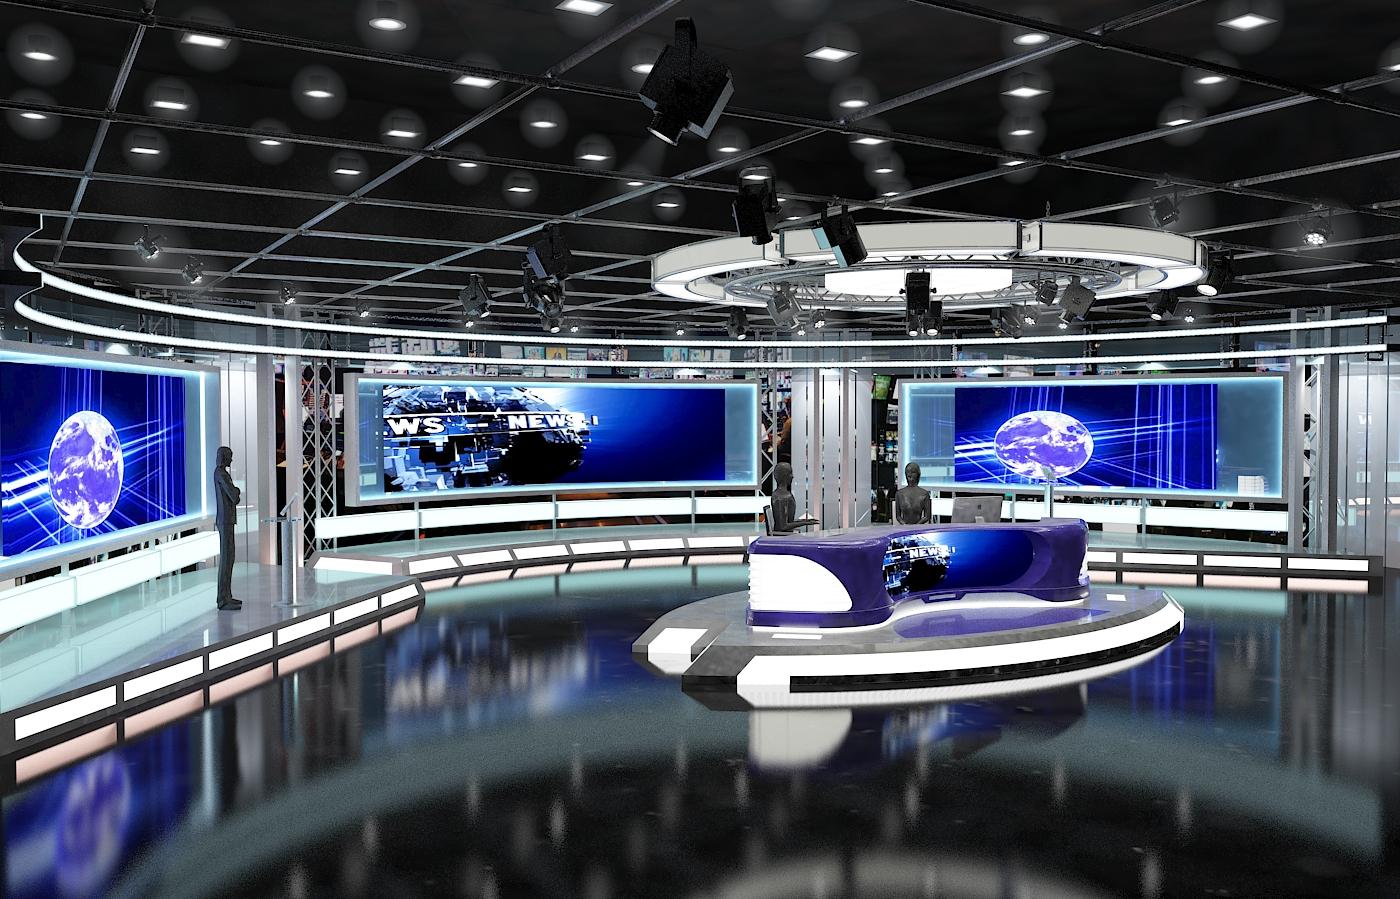 виртуал телевизийн студи цуглуулга vol 6 3d загвар max dxf dwg fbx obj 223368